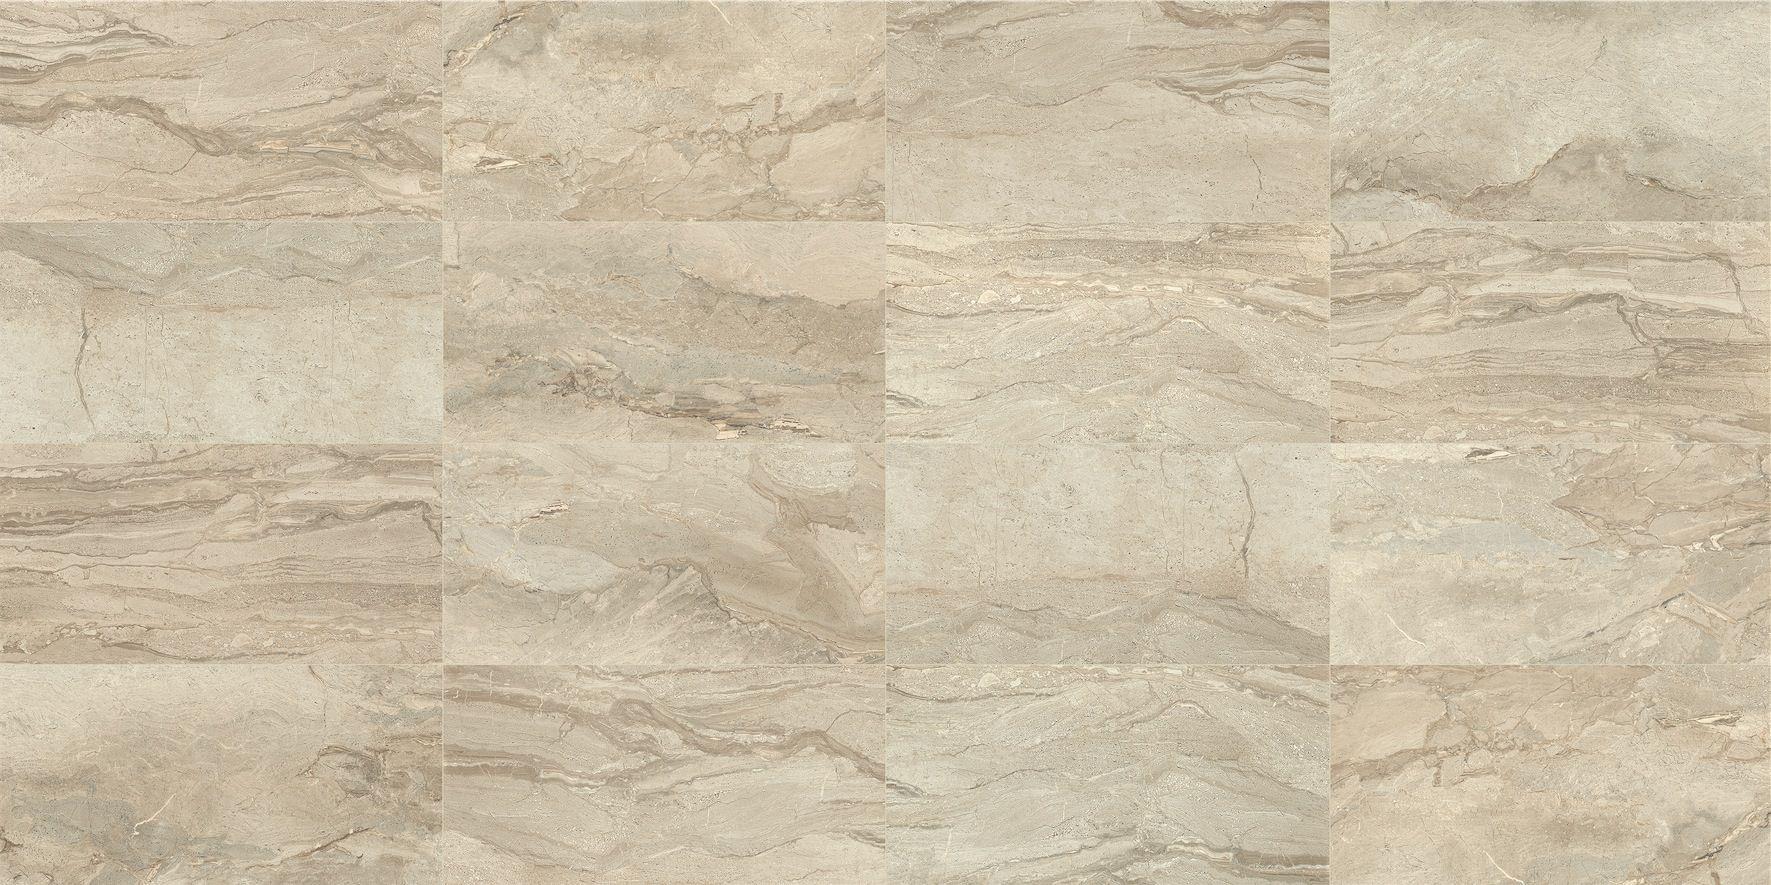 Pin by keila freitas on texturas pedras pinterest group marmi italian floor and wall tile bv tile and stone dailygadgetfo Gallery